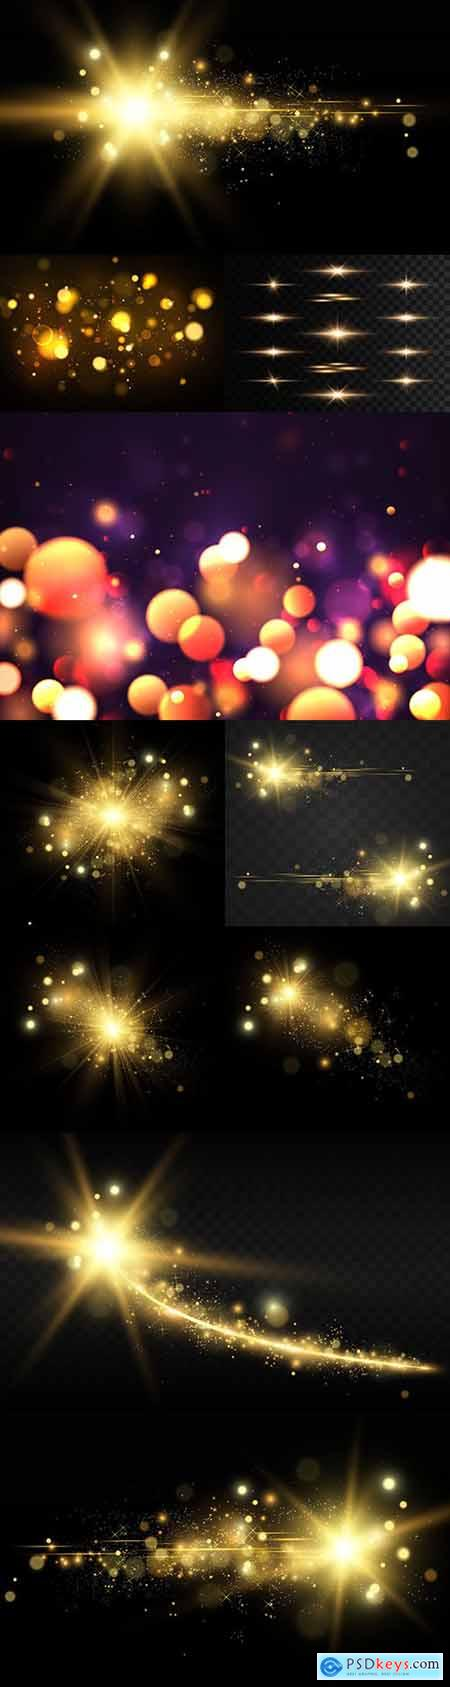 Golden bright star light effect design illustration